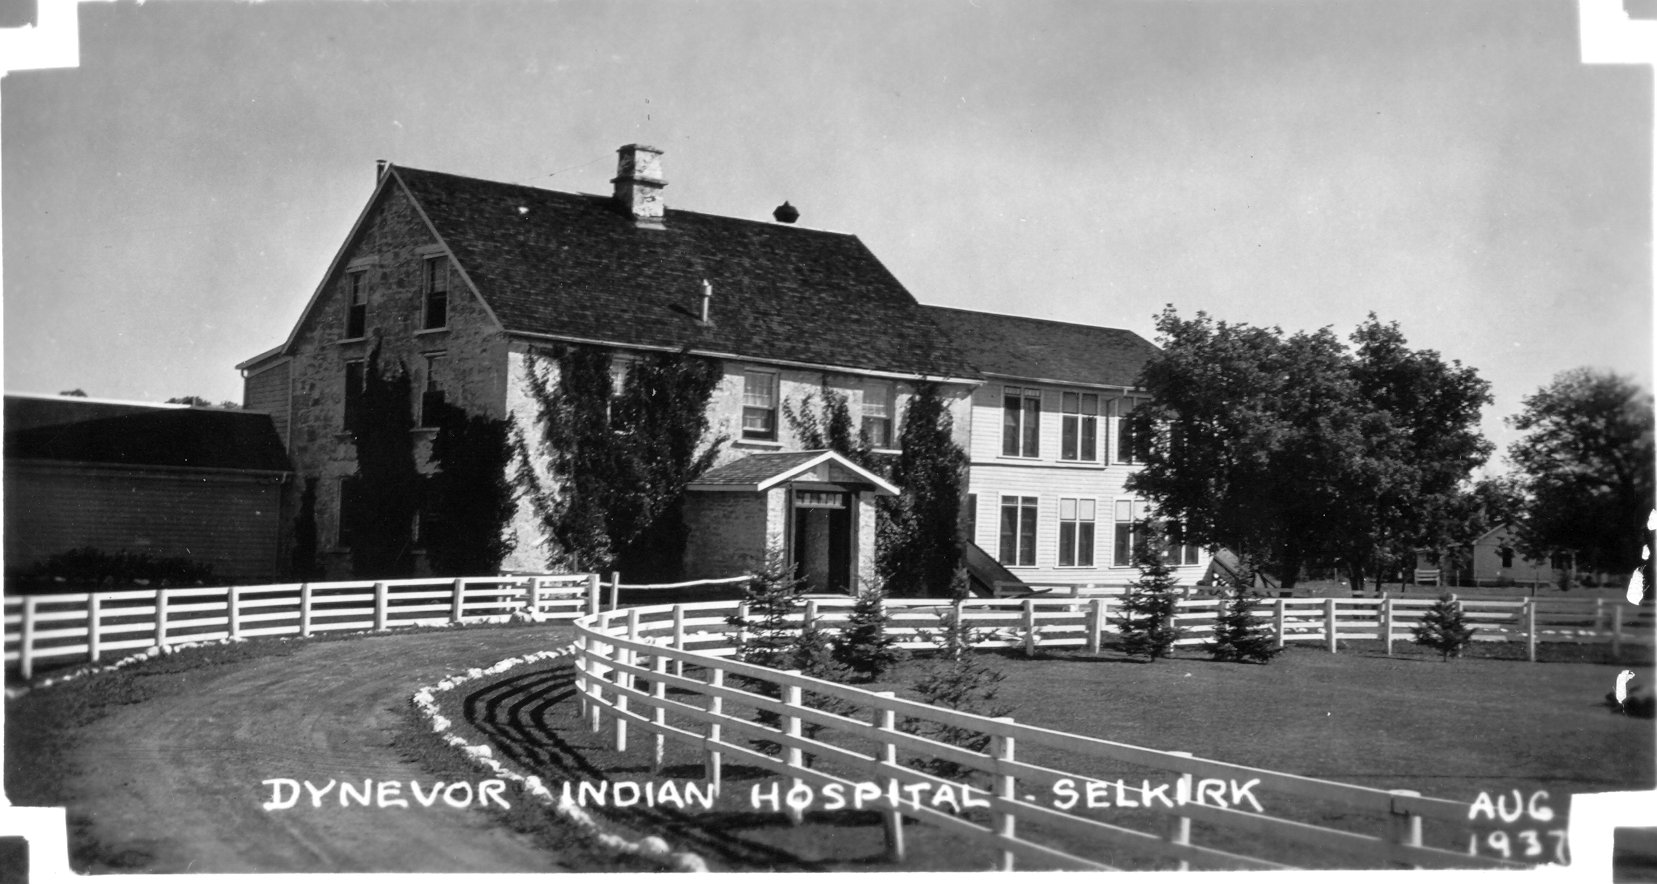 1937 Dynevor Hospital